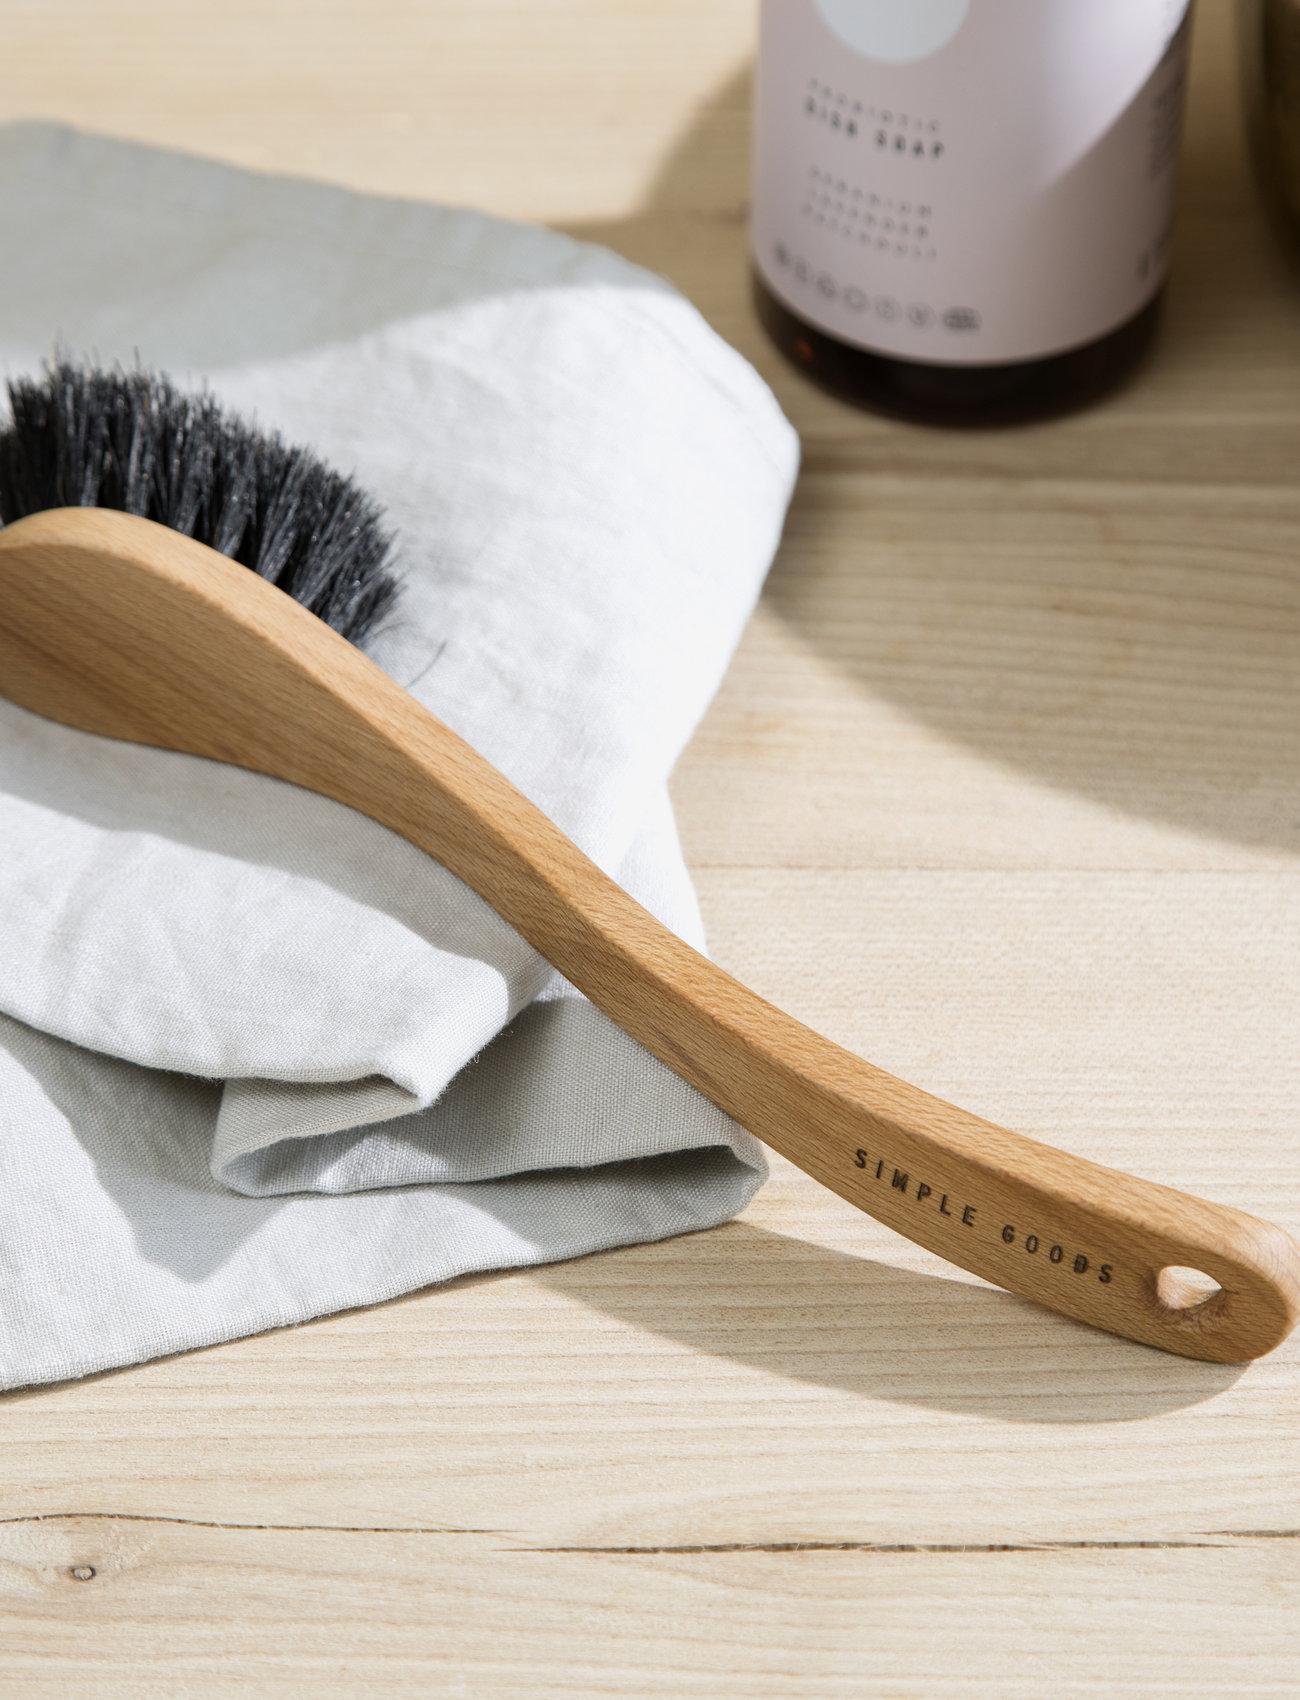 Simple Goods - Dish Brush Soft - disktrasor & diskborstar - wood - 1